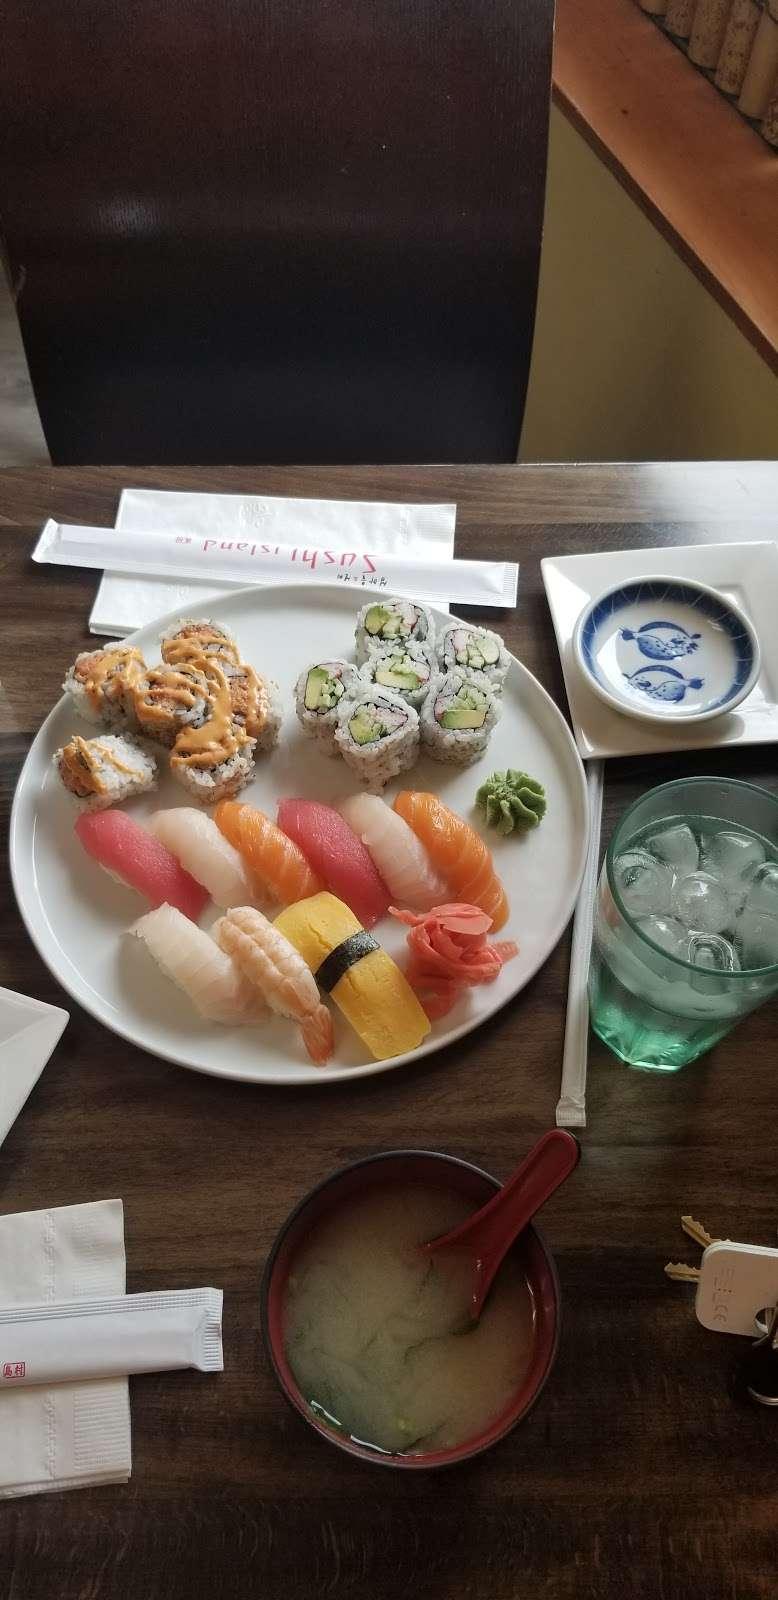 Sushi Island - restaurant  | Photo 3 of 8 | Address: 520 Bergen Blvd, Palisades Park, NJ 07650, USA | Phone: (201) 346-9006